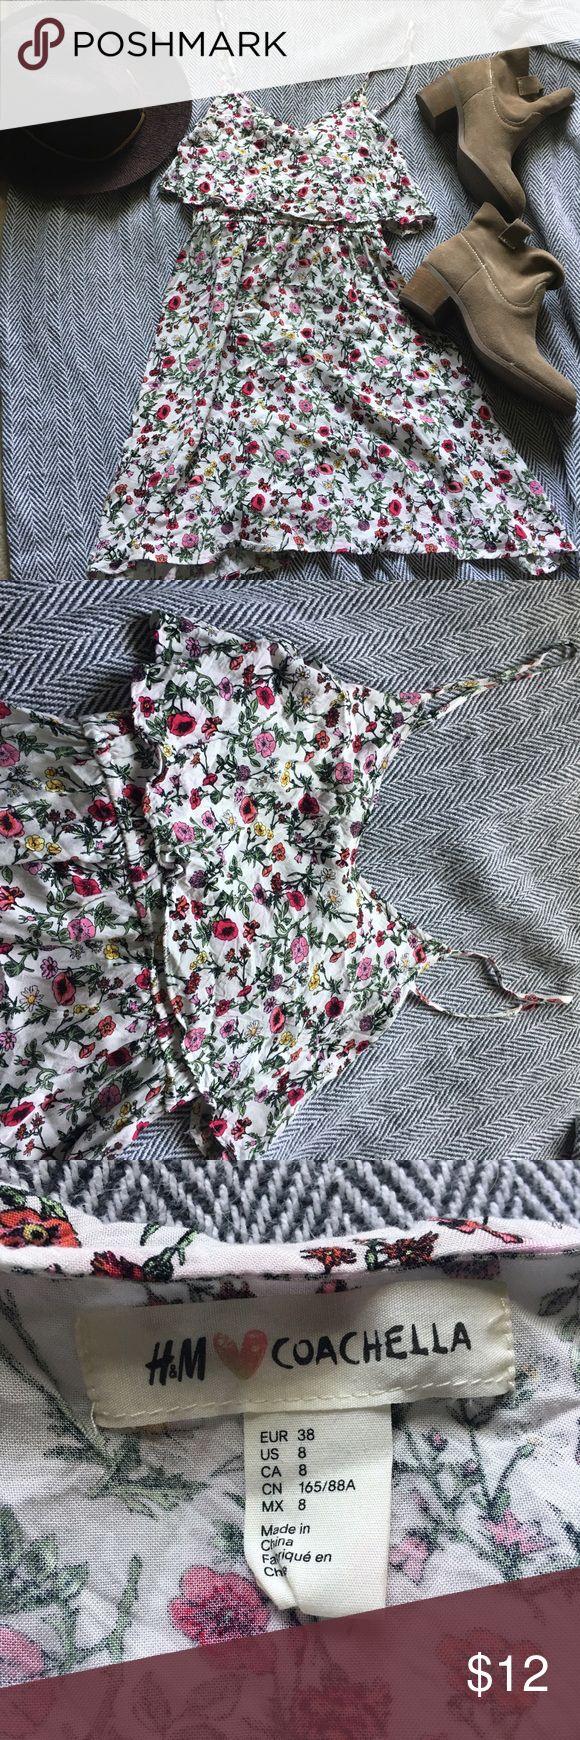 Coachella dress Cute little festival/summer dress from H&M's Coachella collection. Floral design. H&M Dresses Mini